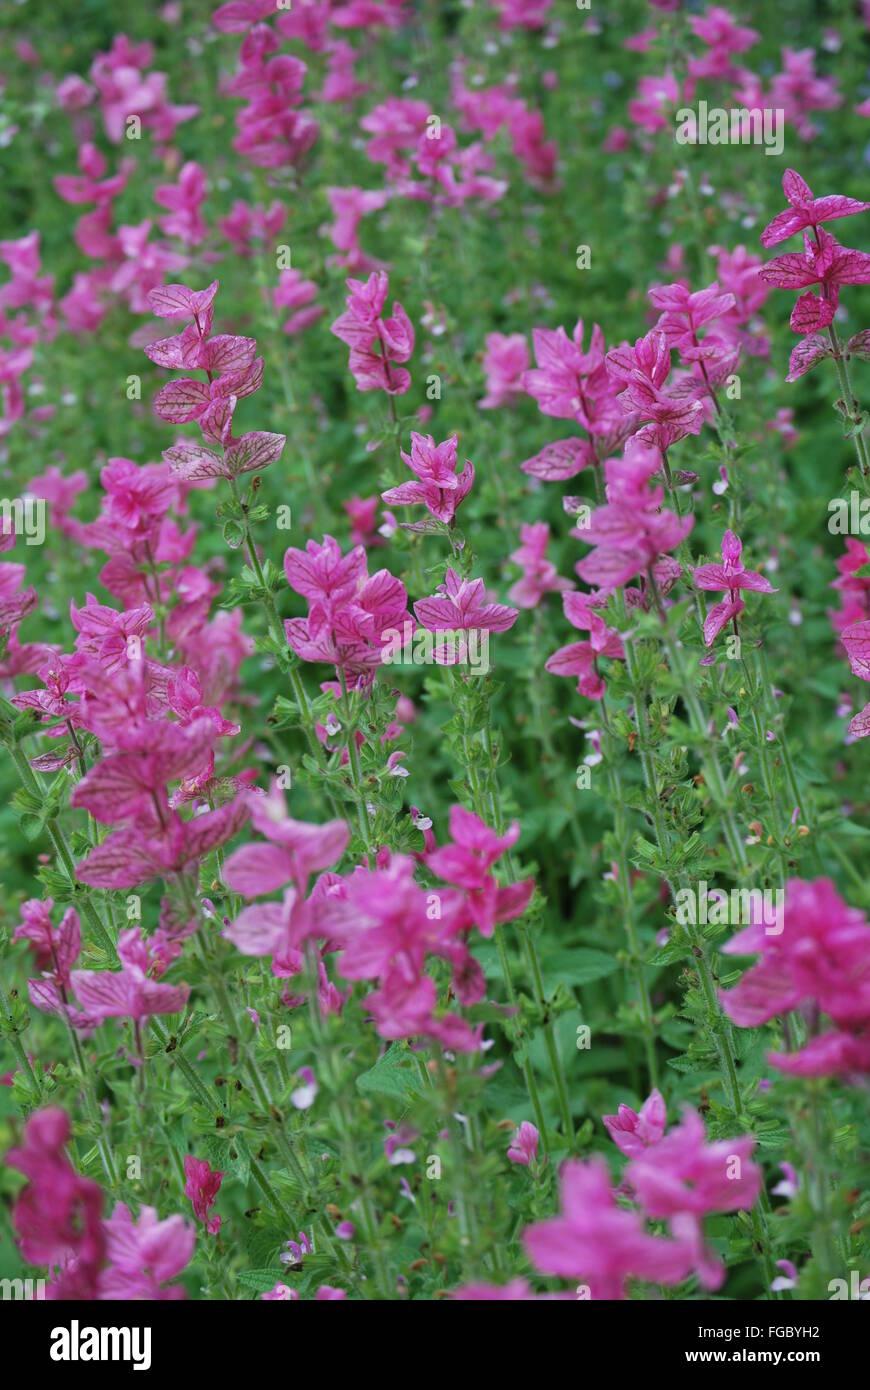 Pink Flowering Plants Growing On Field Stock Photo 96149454 Alamy